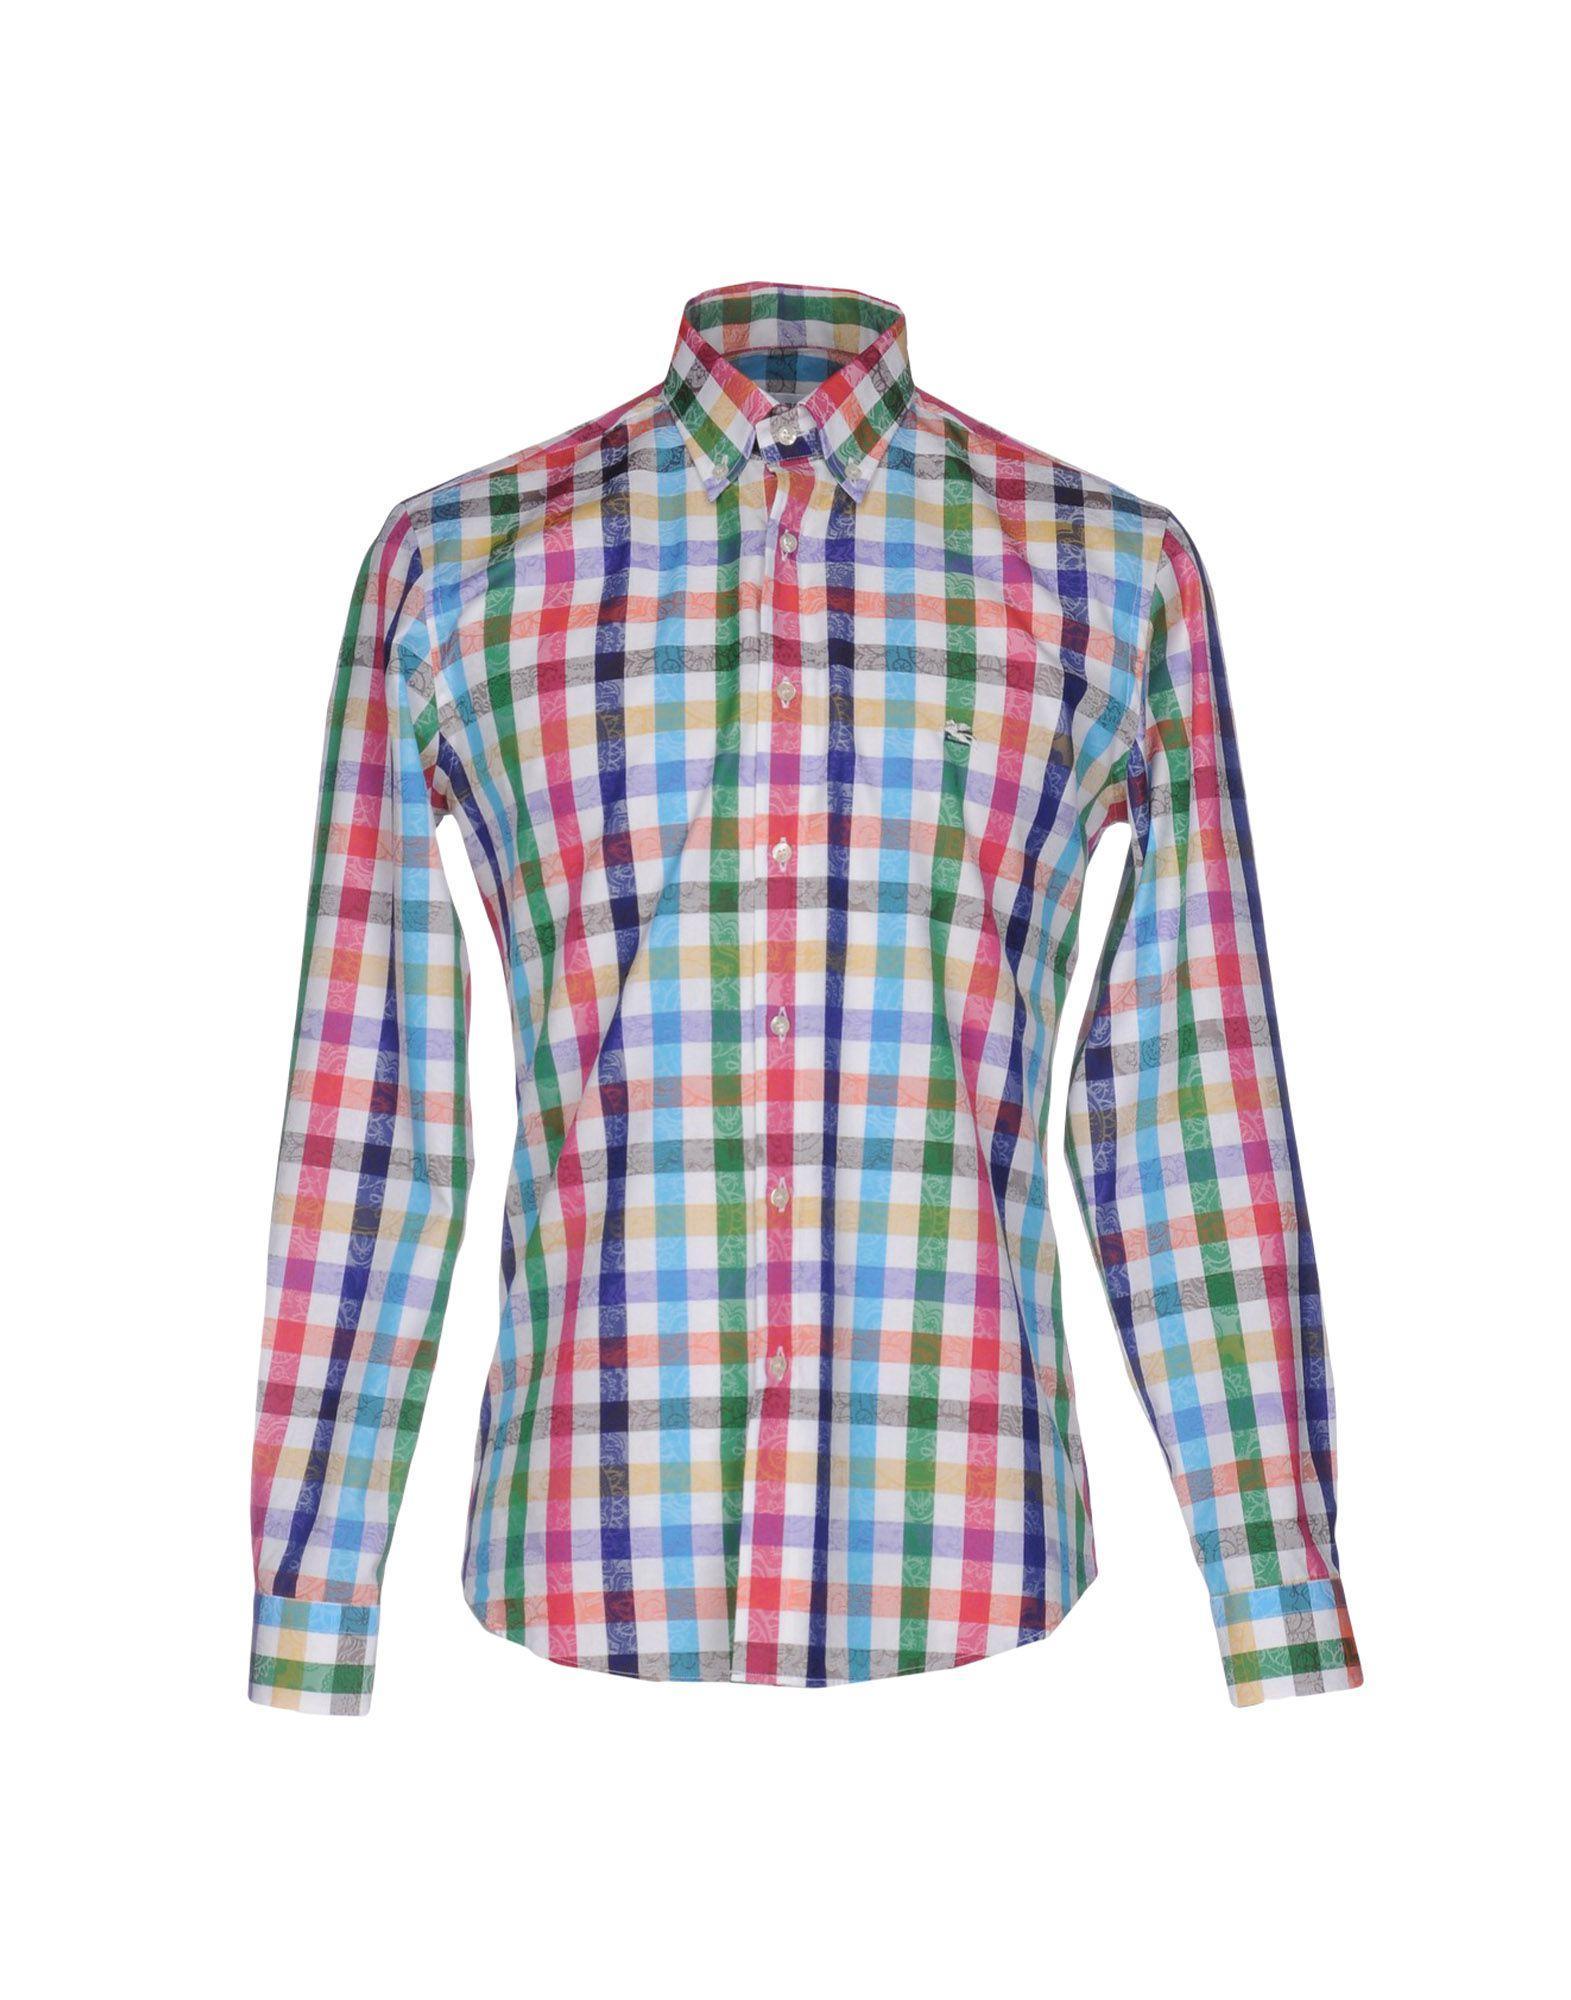 Lyst etro shirt in white for men for Etro men s shirts